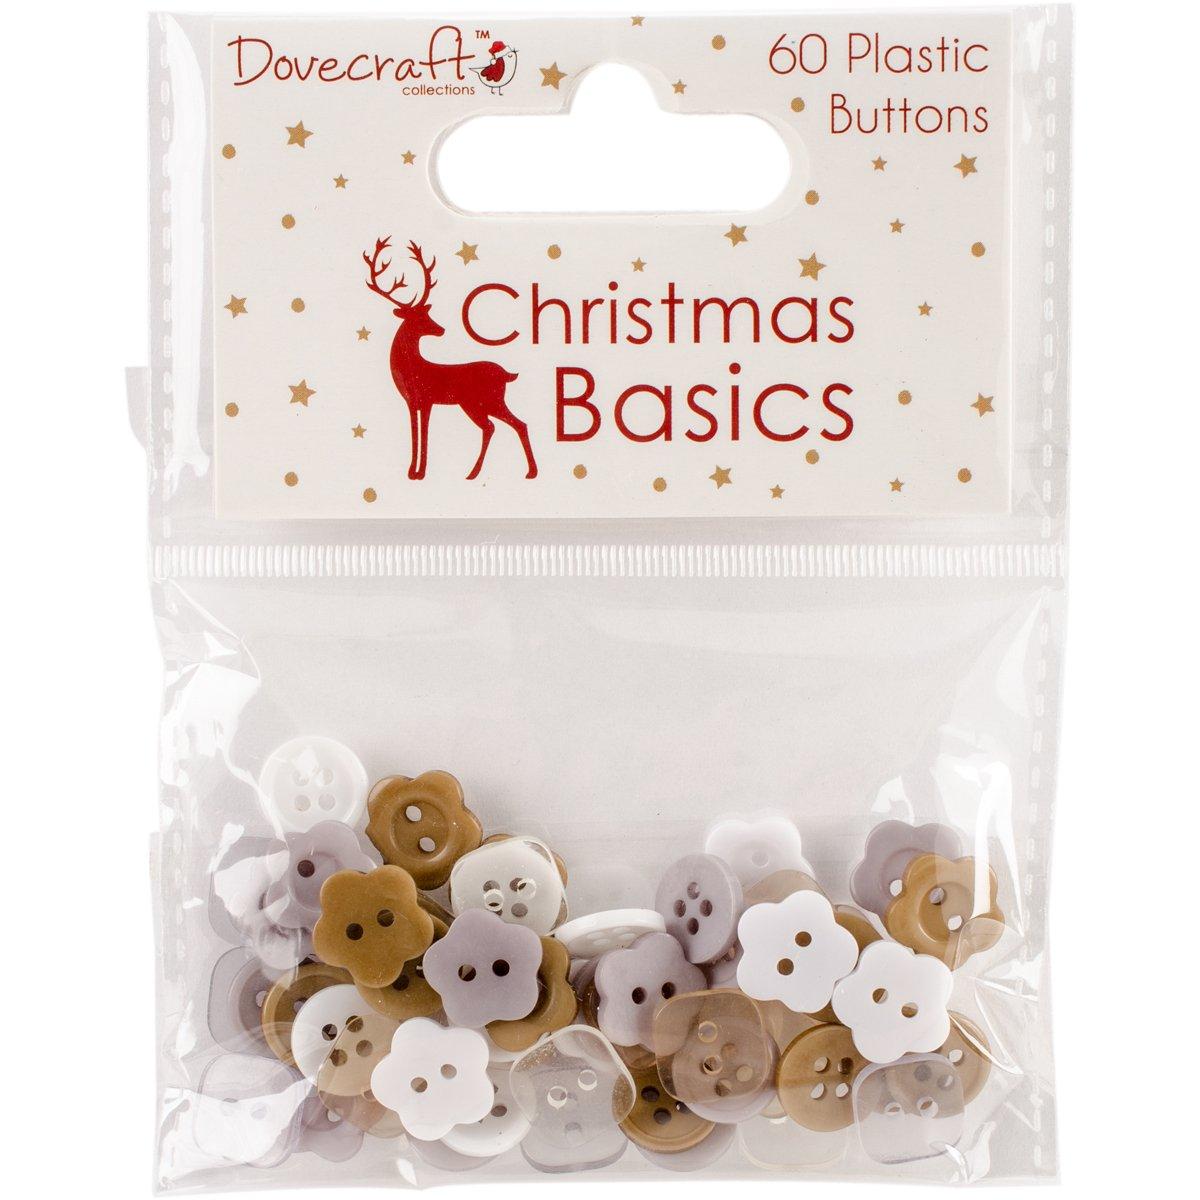 Dovecraft Christmas Basics Plastic Buttons 60/Pkg